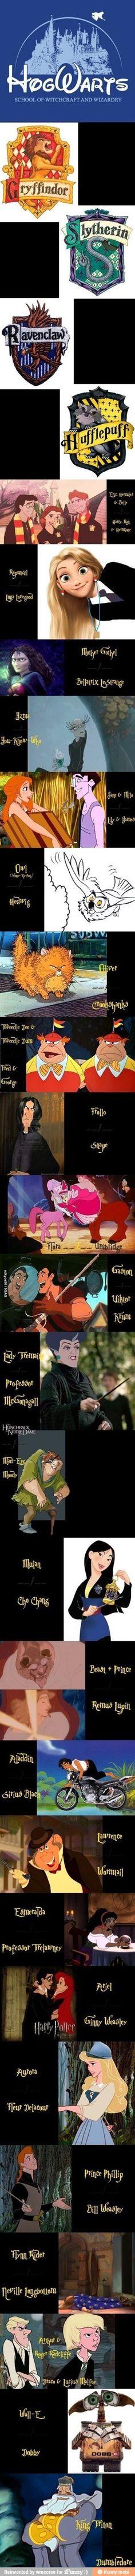 Disney as Harry Potter